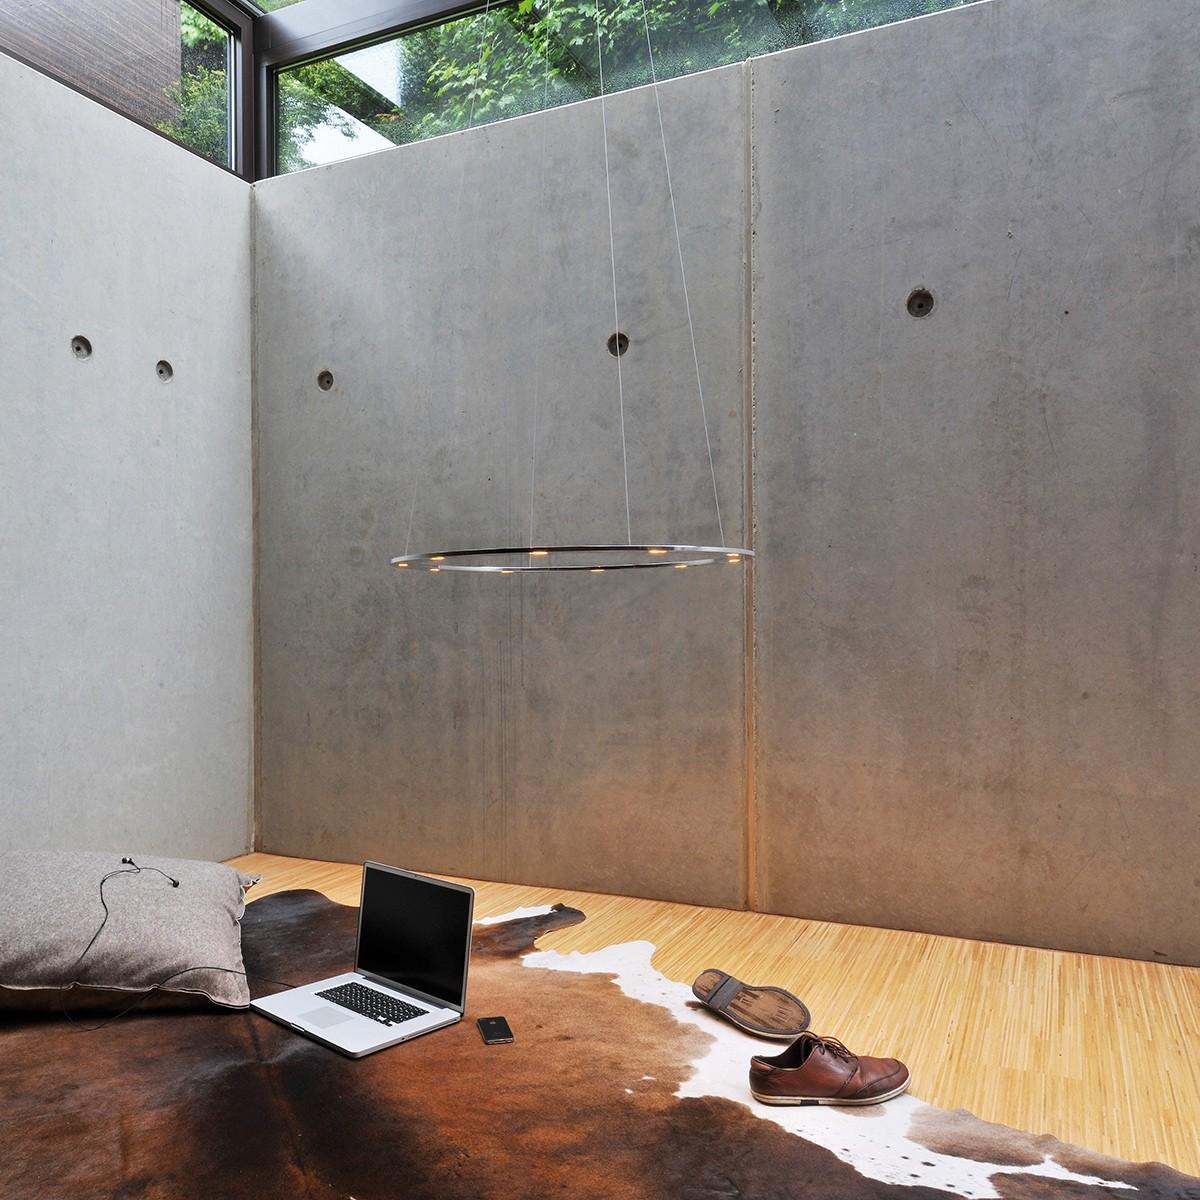 Byok Piani Rondo Pendelleuchte, Ø: 68 cm, Aluminium poliert